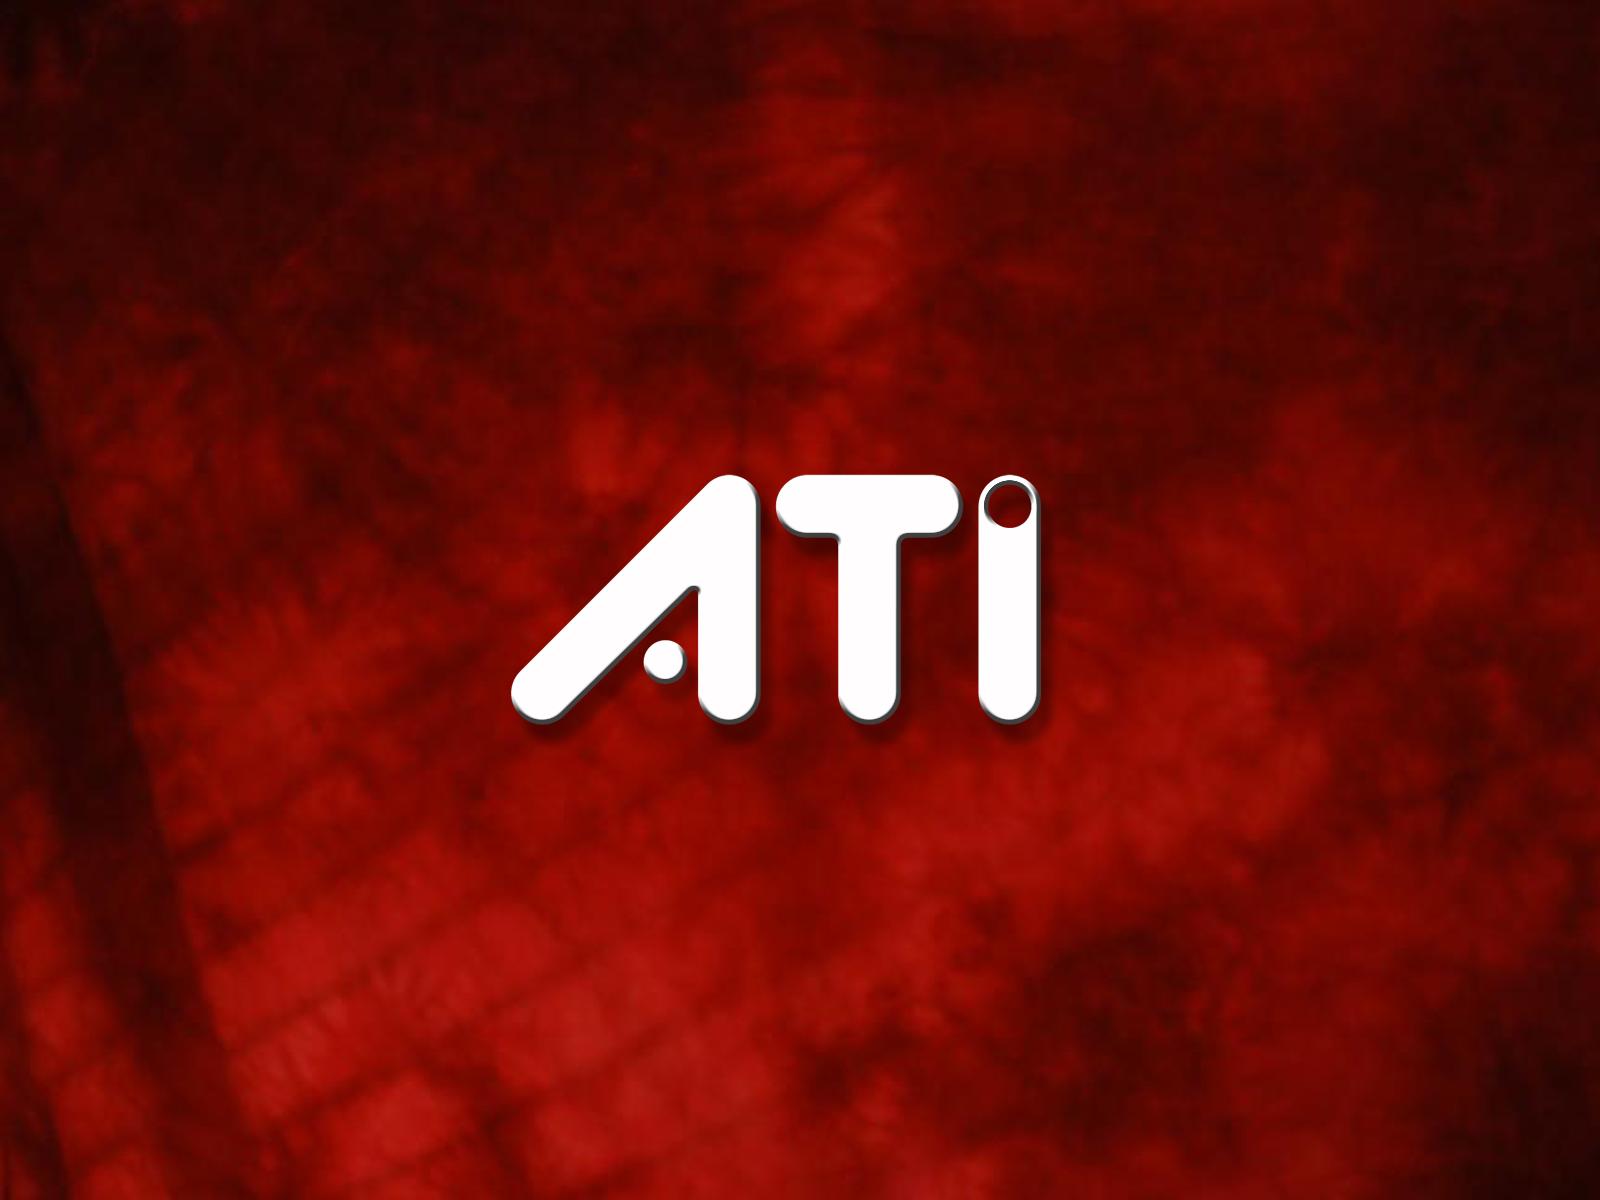 free wallpapers blog: ati wallpaper